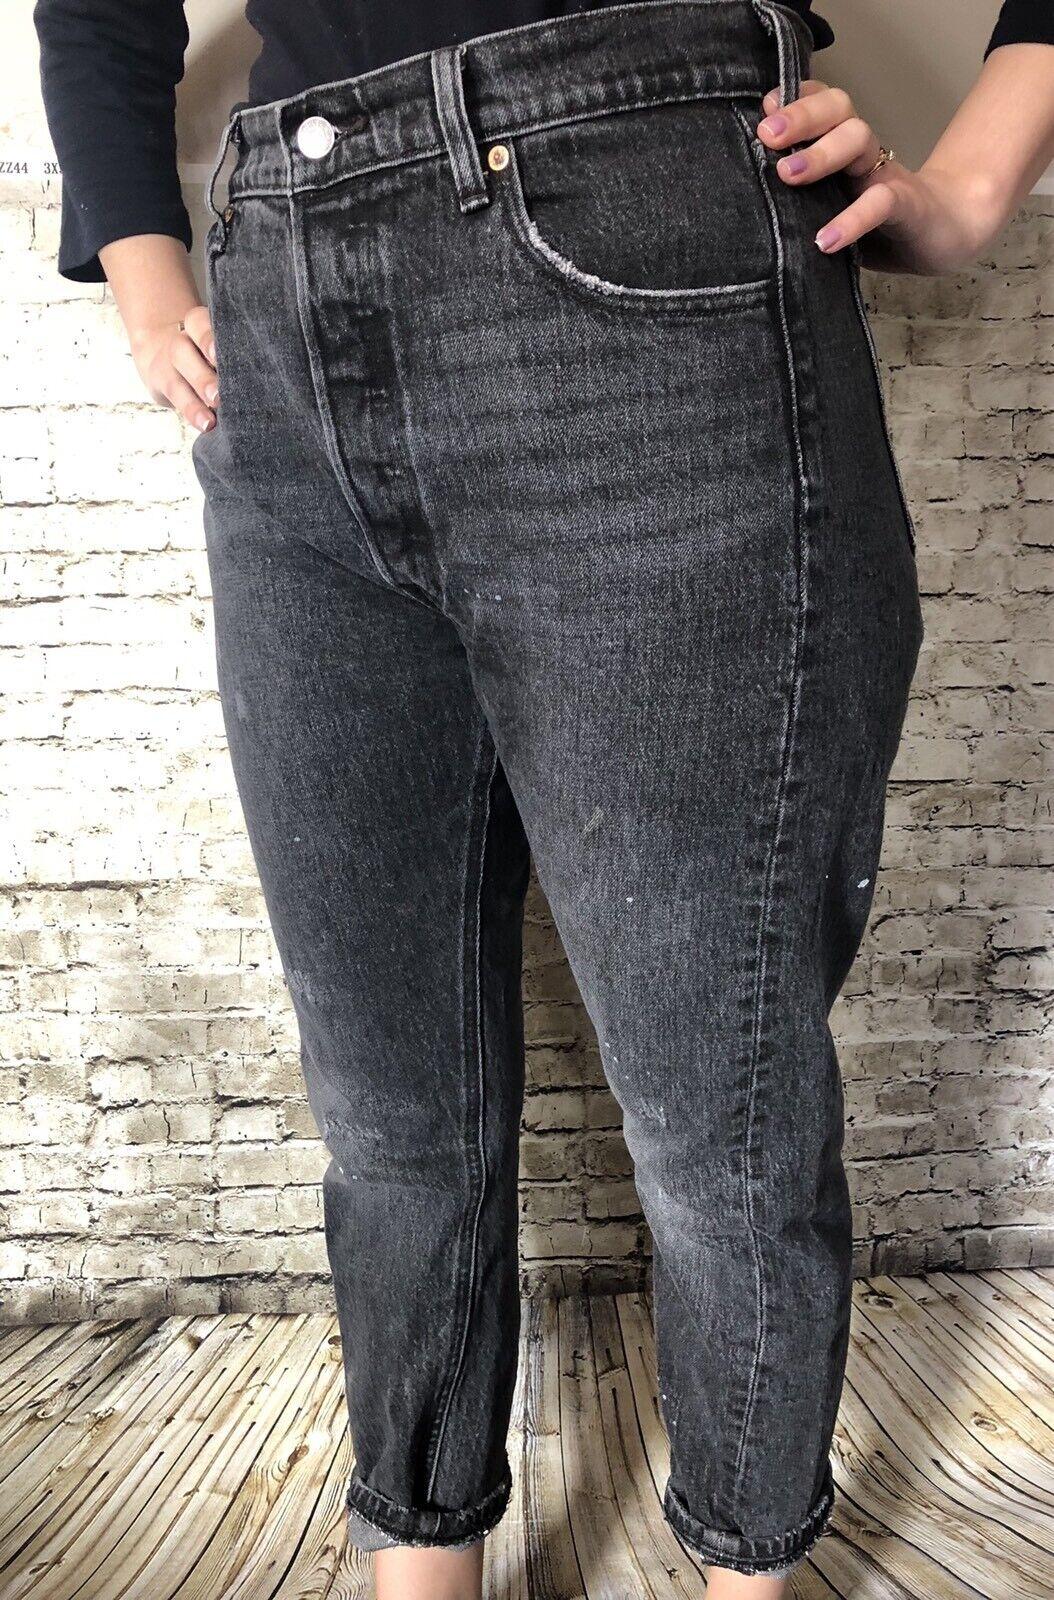 LEVIS 501 Mom Jeans Sz 34x26 ALTERED SKINNY DISTR… - image 1